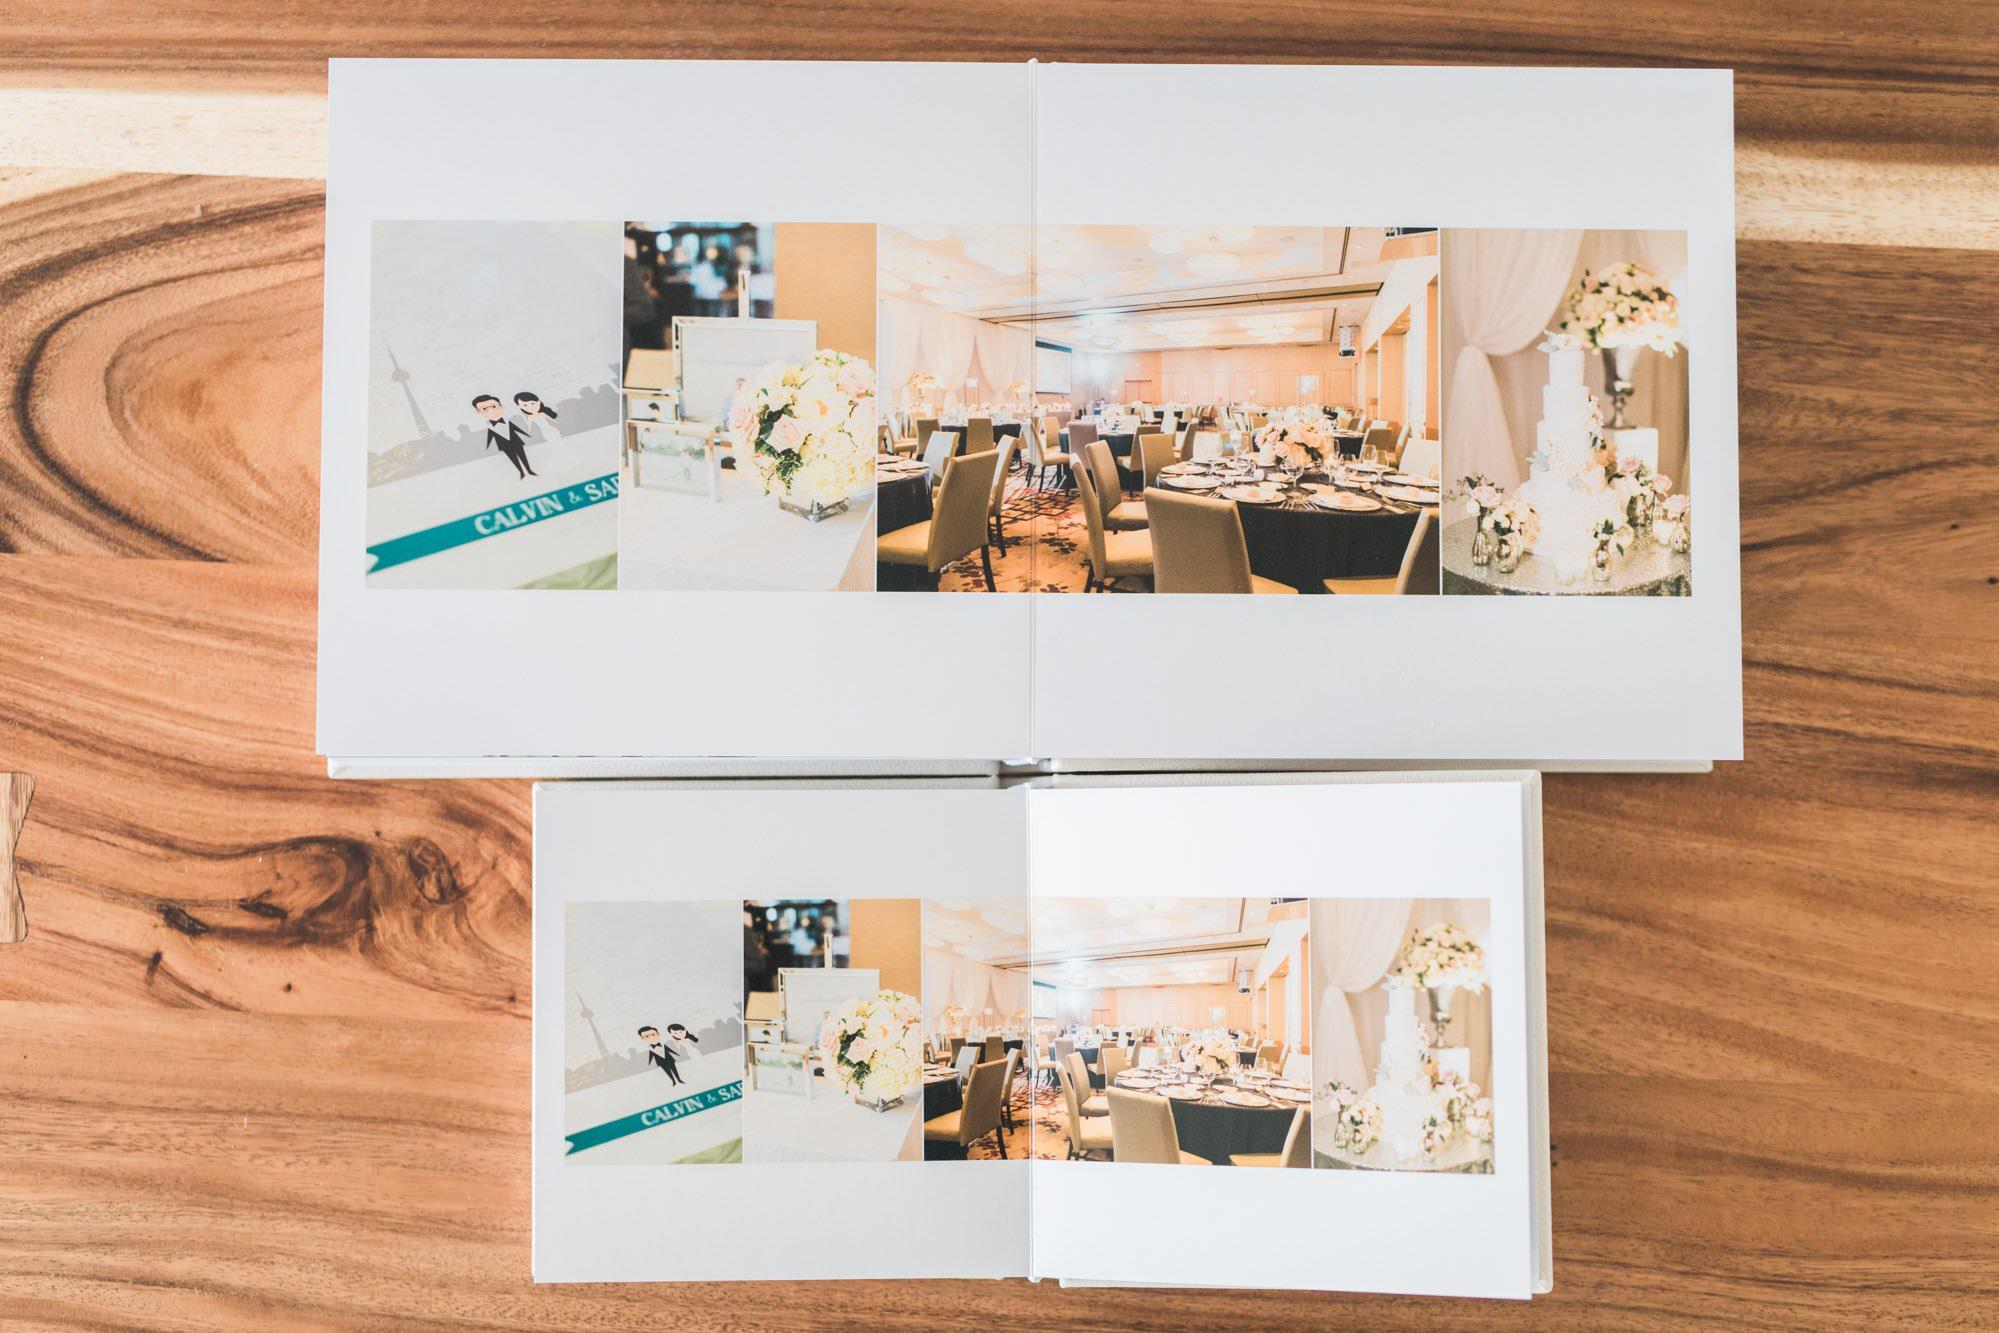 Shangri_La_Toronto_Heirloom_Wedding_Albums_Photos-Rhythm_Photography